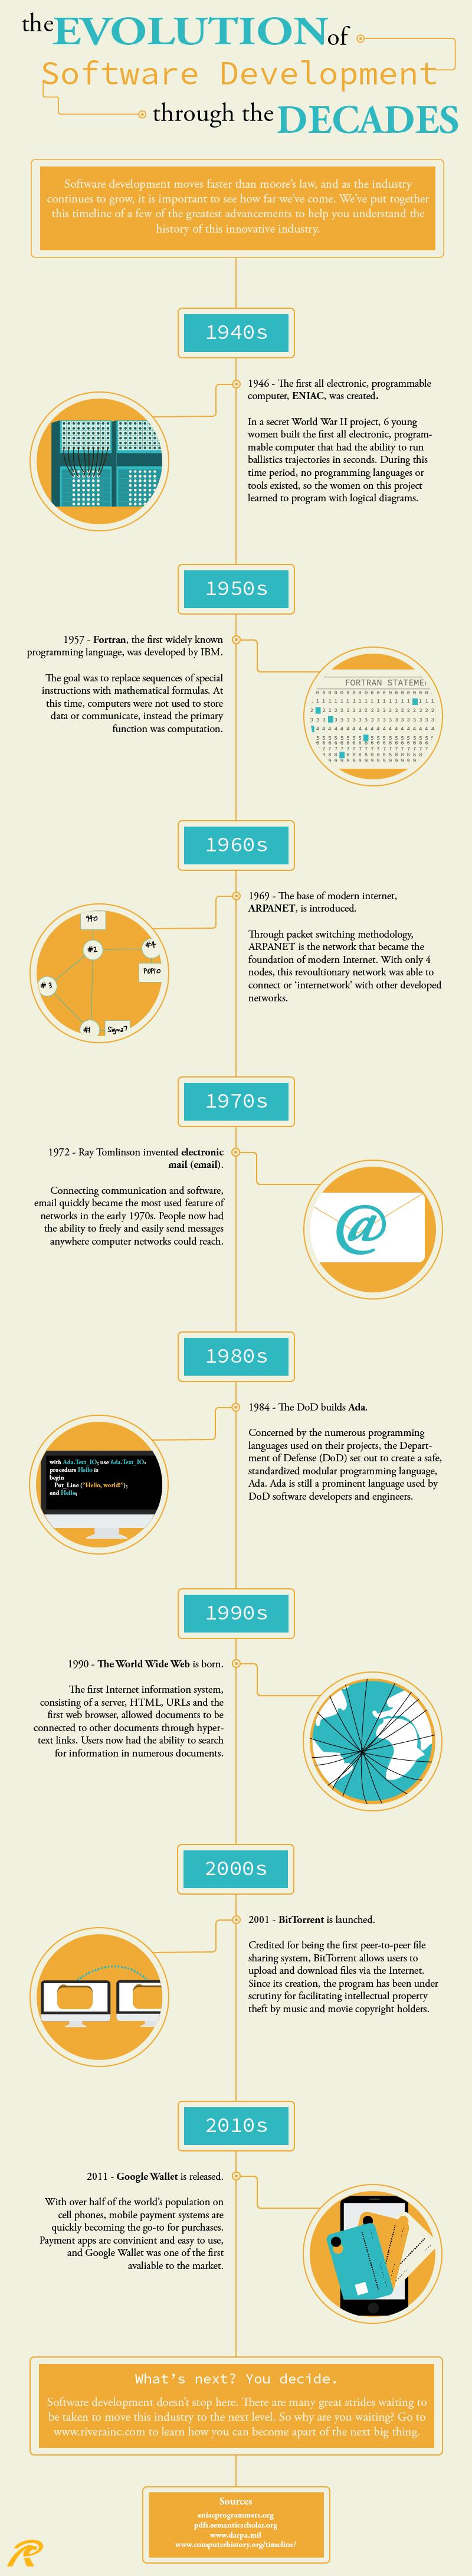 Software Development History